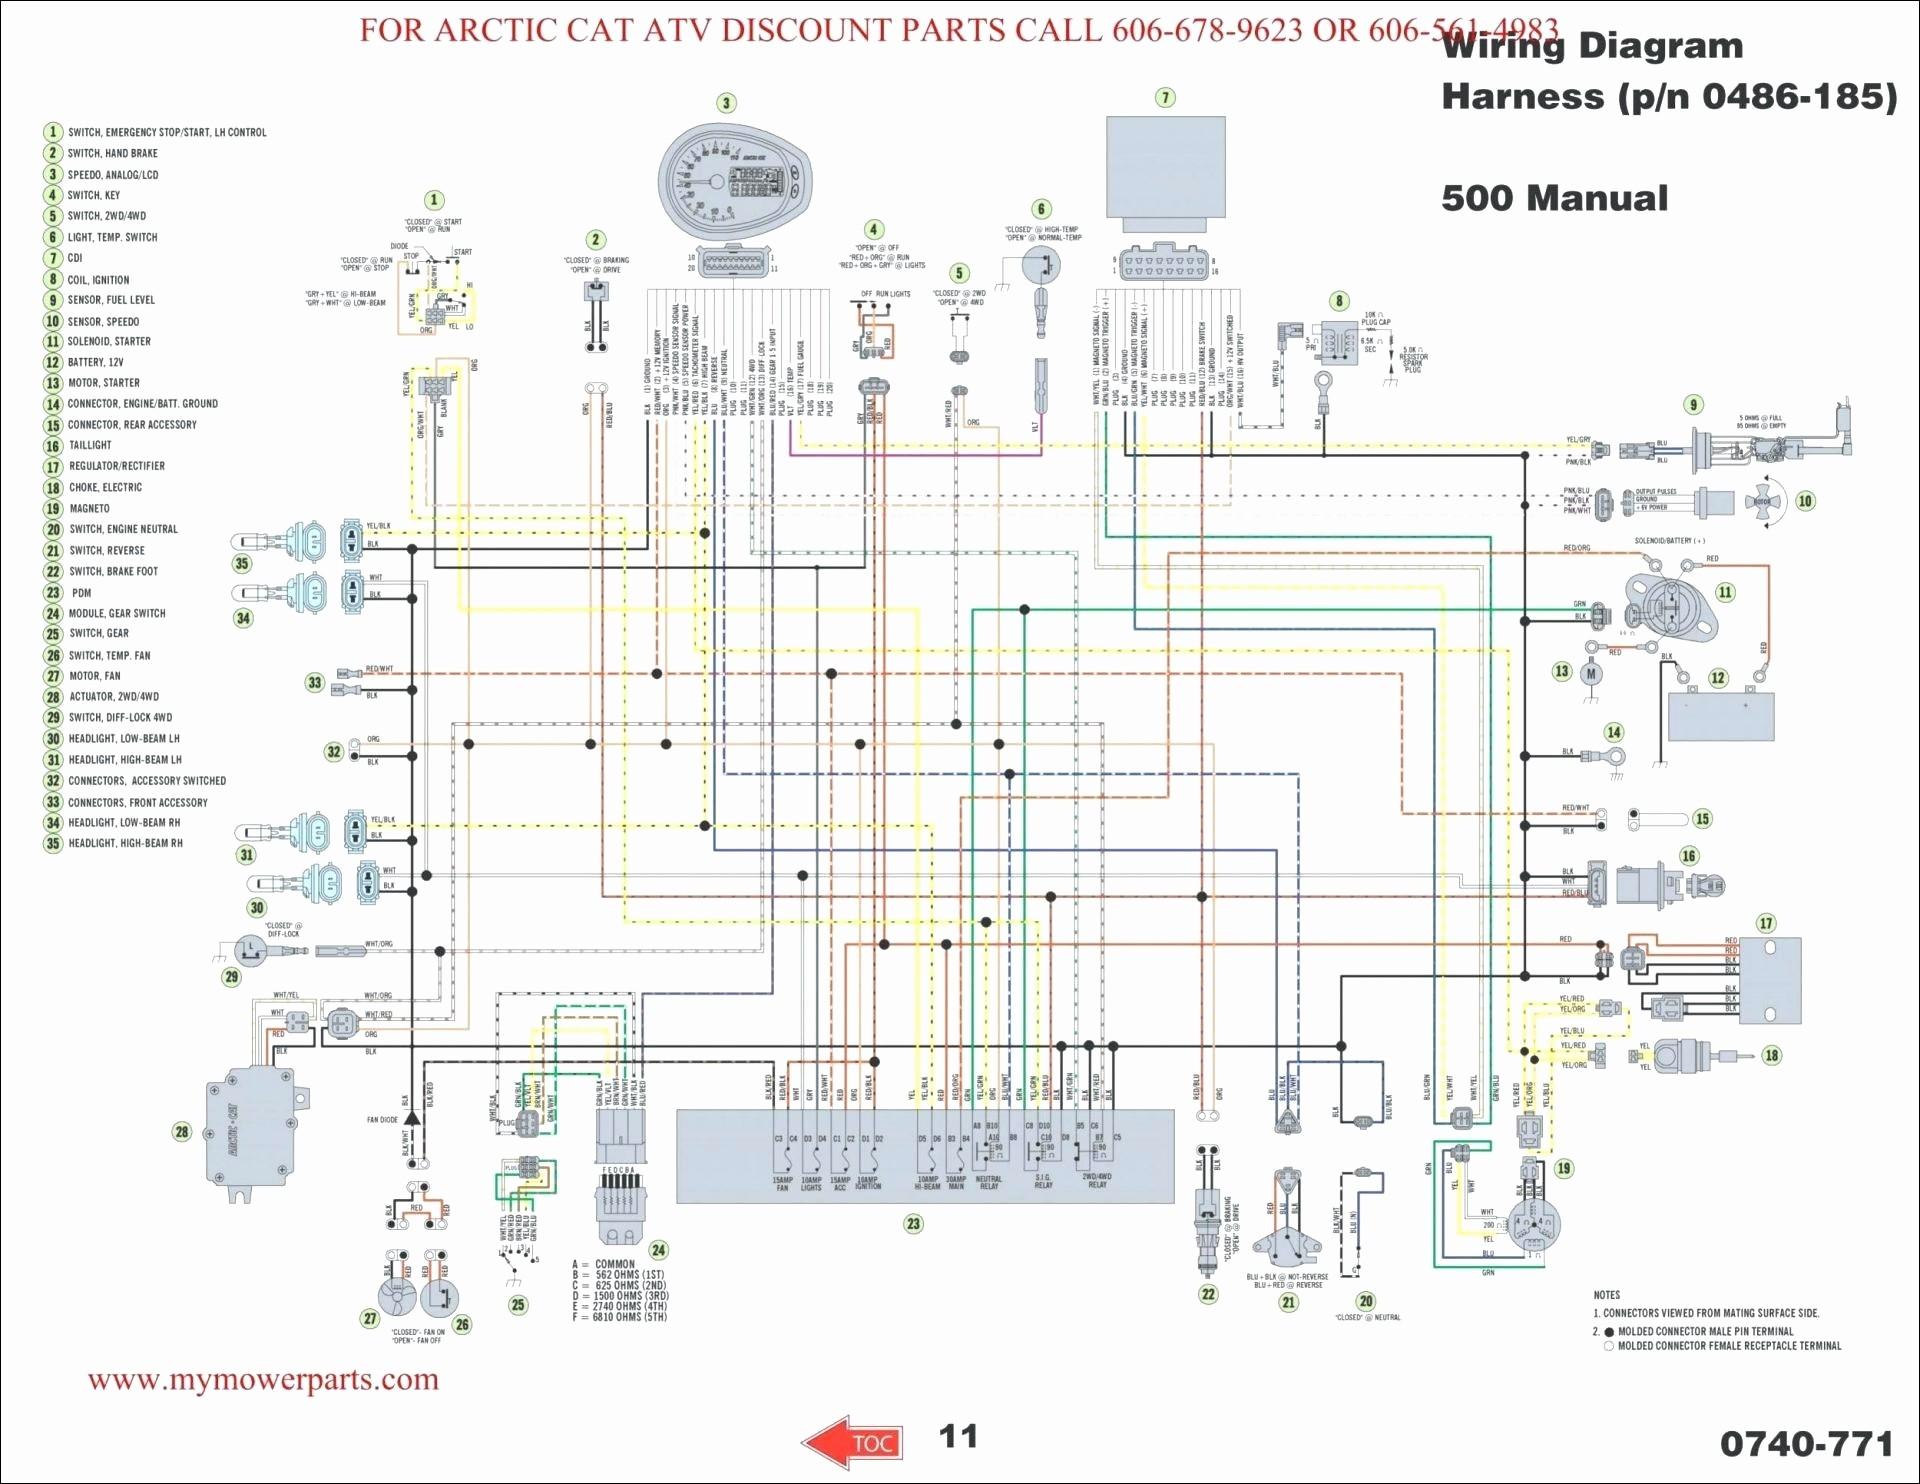 Ford Hei Distributor Wiring Diagram Beautiful 2001 Yamaha Warrior Wiring Diagram Wellread